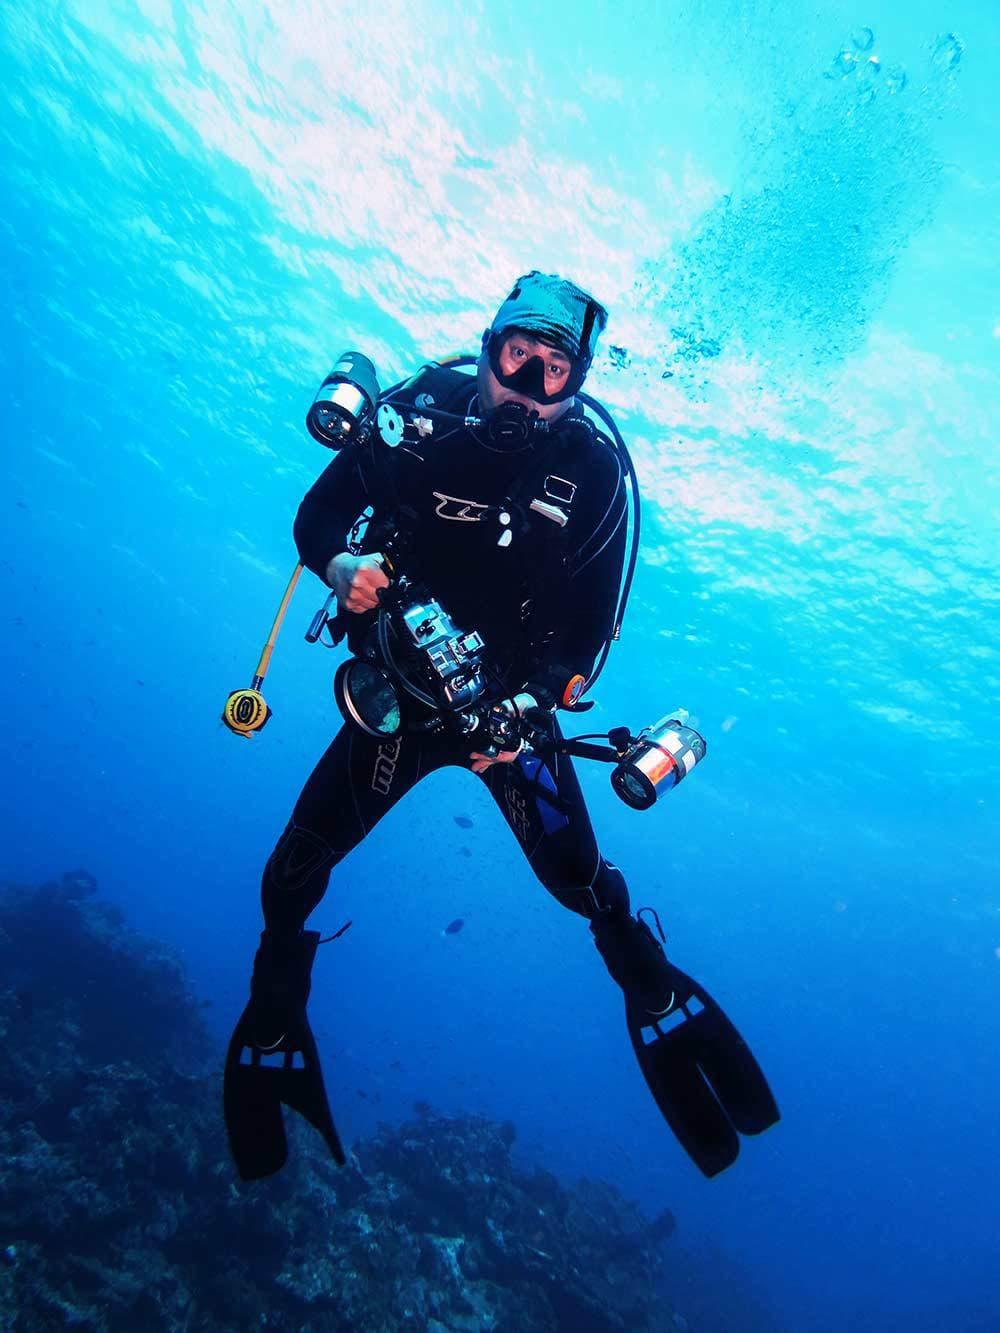 Fotografía submarina con equipo autónomo